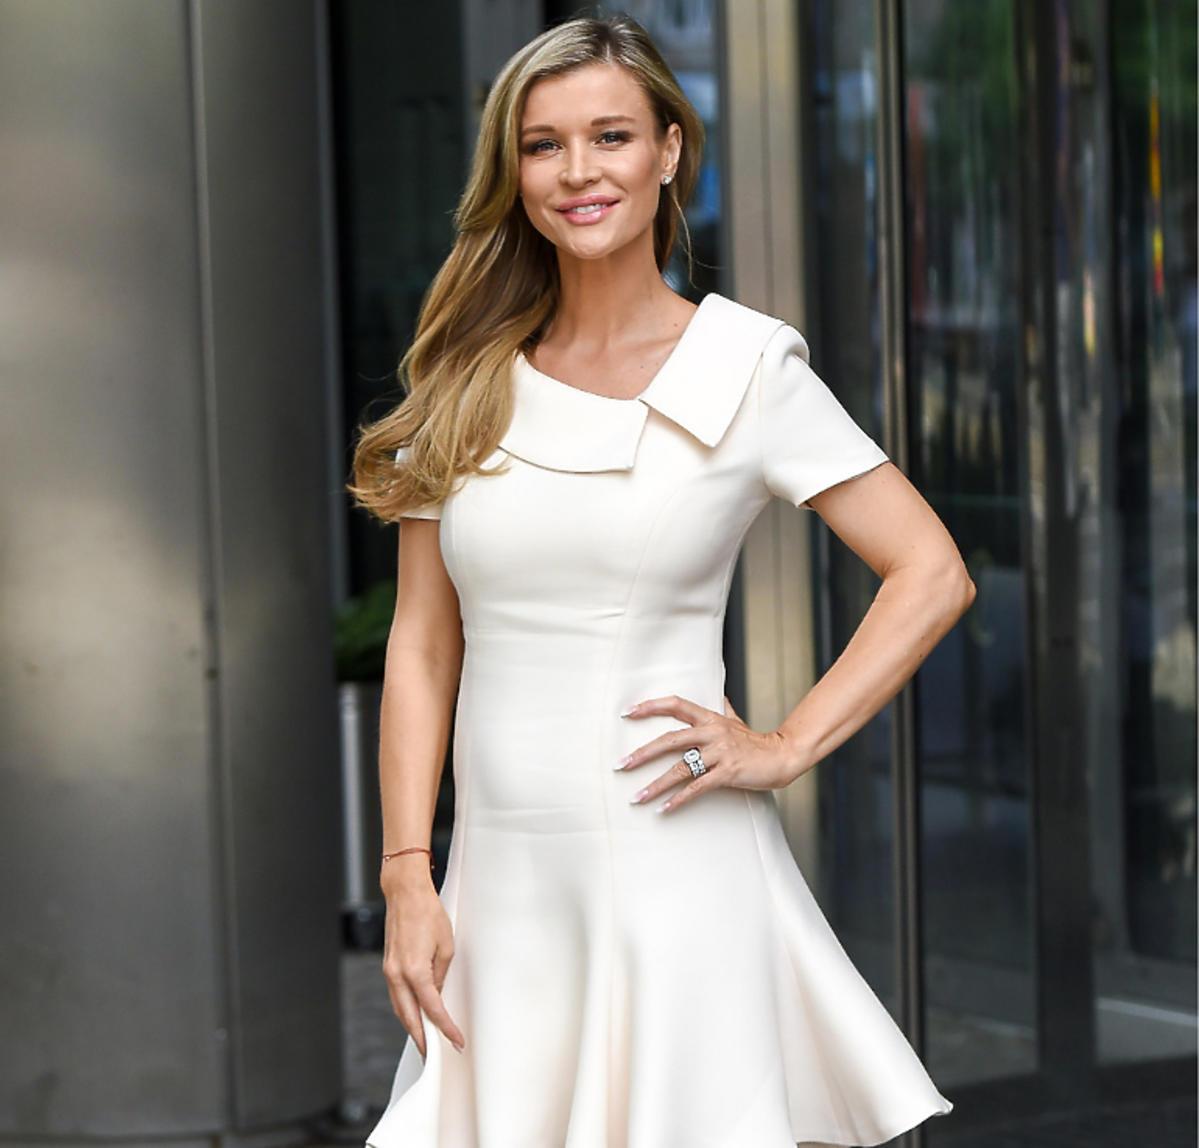 Joanna Krupa w białej sukience